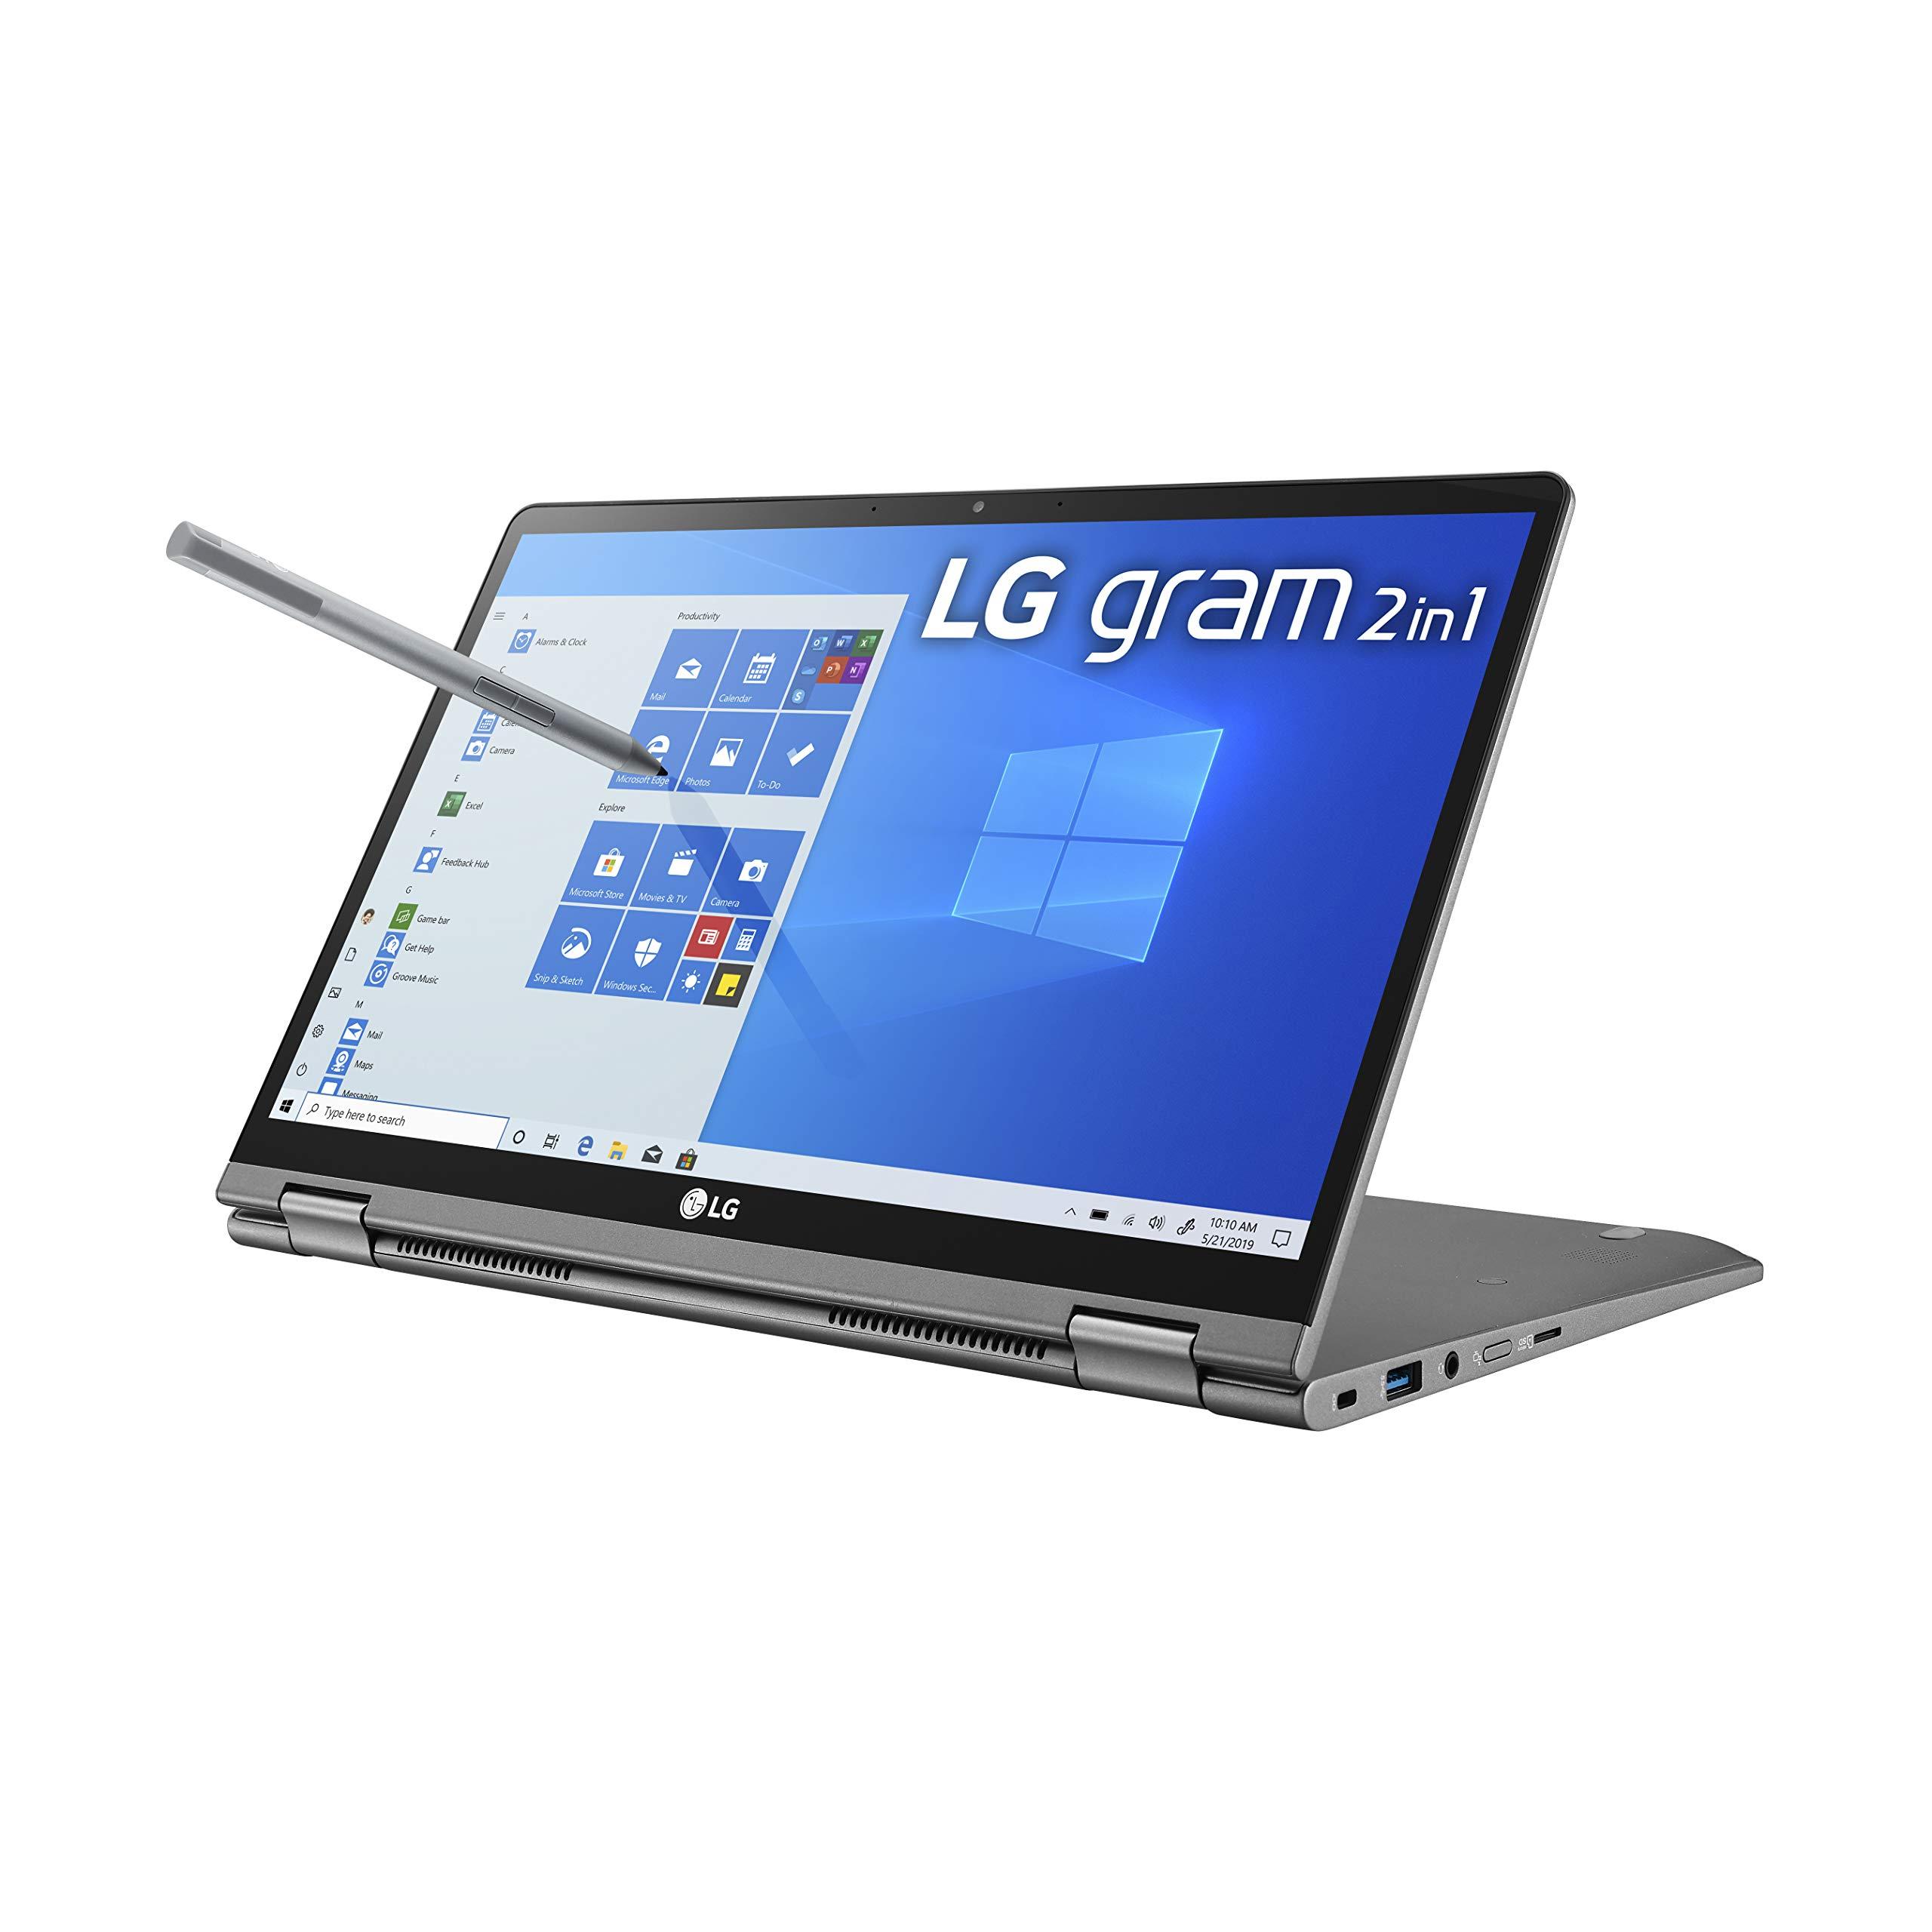 LG Gram 2-in-1 Convertible Laptop: 14 inch  Full HD IPS Touchscreen Display, Intel 10th Gen Core i7-10510U CPU, 16GB RAM, 1TB (512GB x 2) M.2 MVMe SSD, Thunderbolt 3, 20.5 Hour Battery 14T90N (2020) - ,396.99